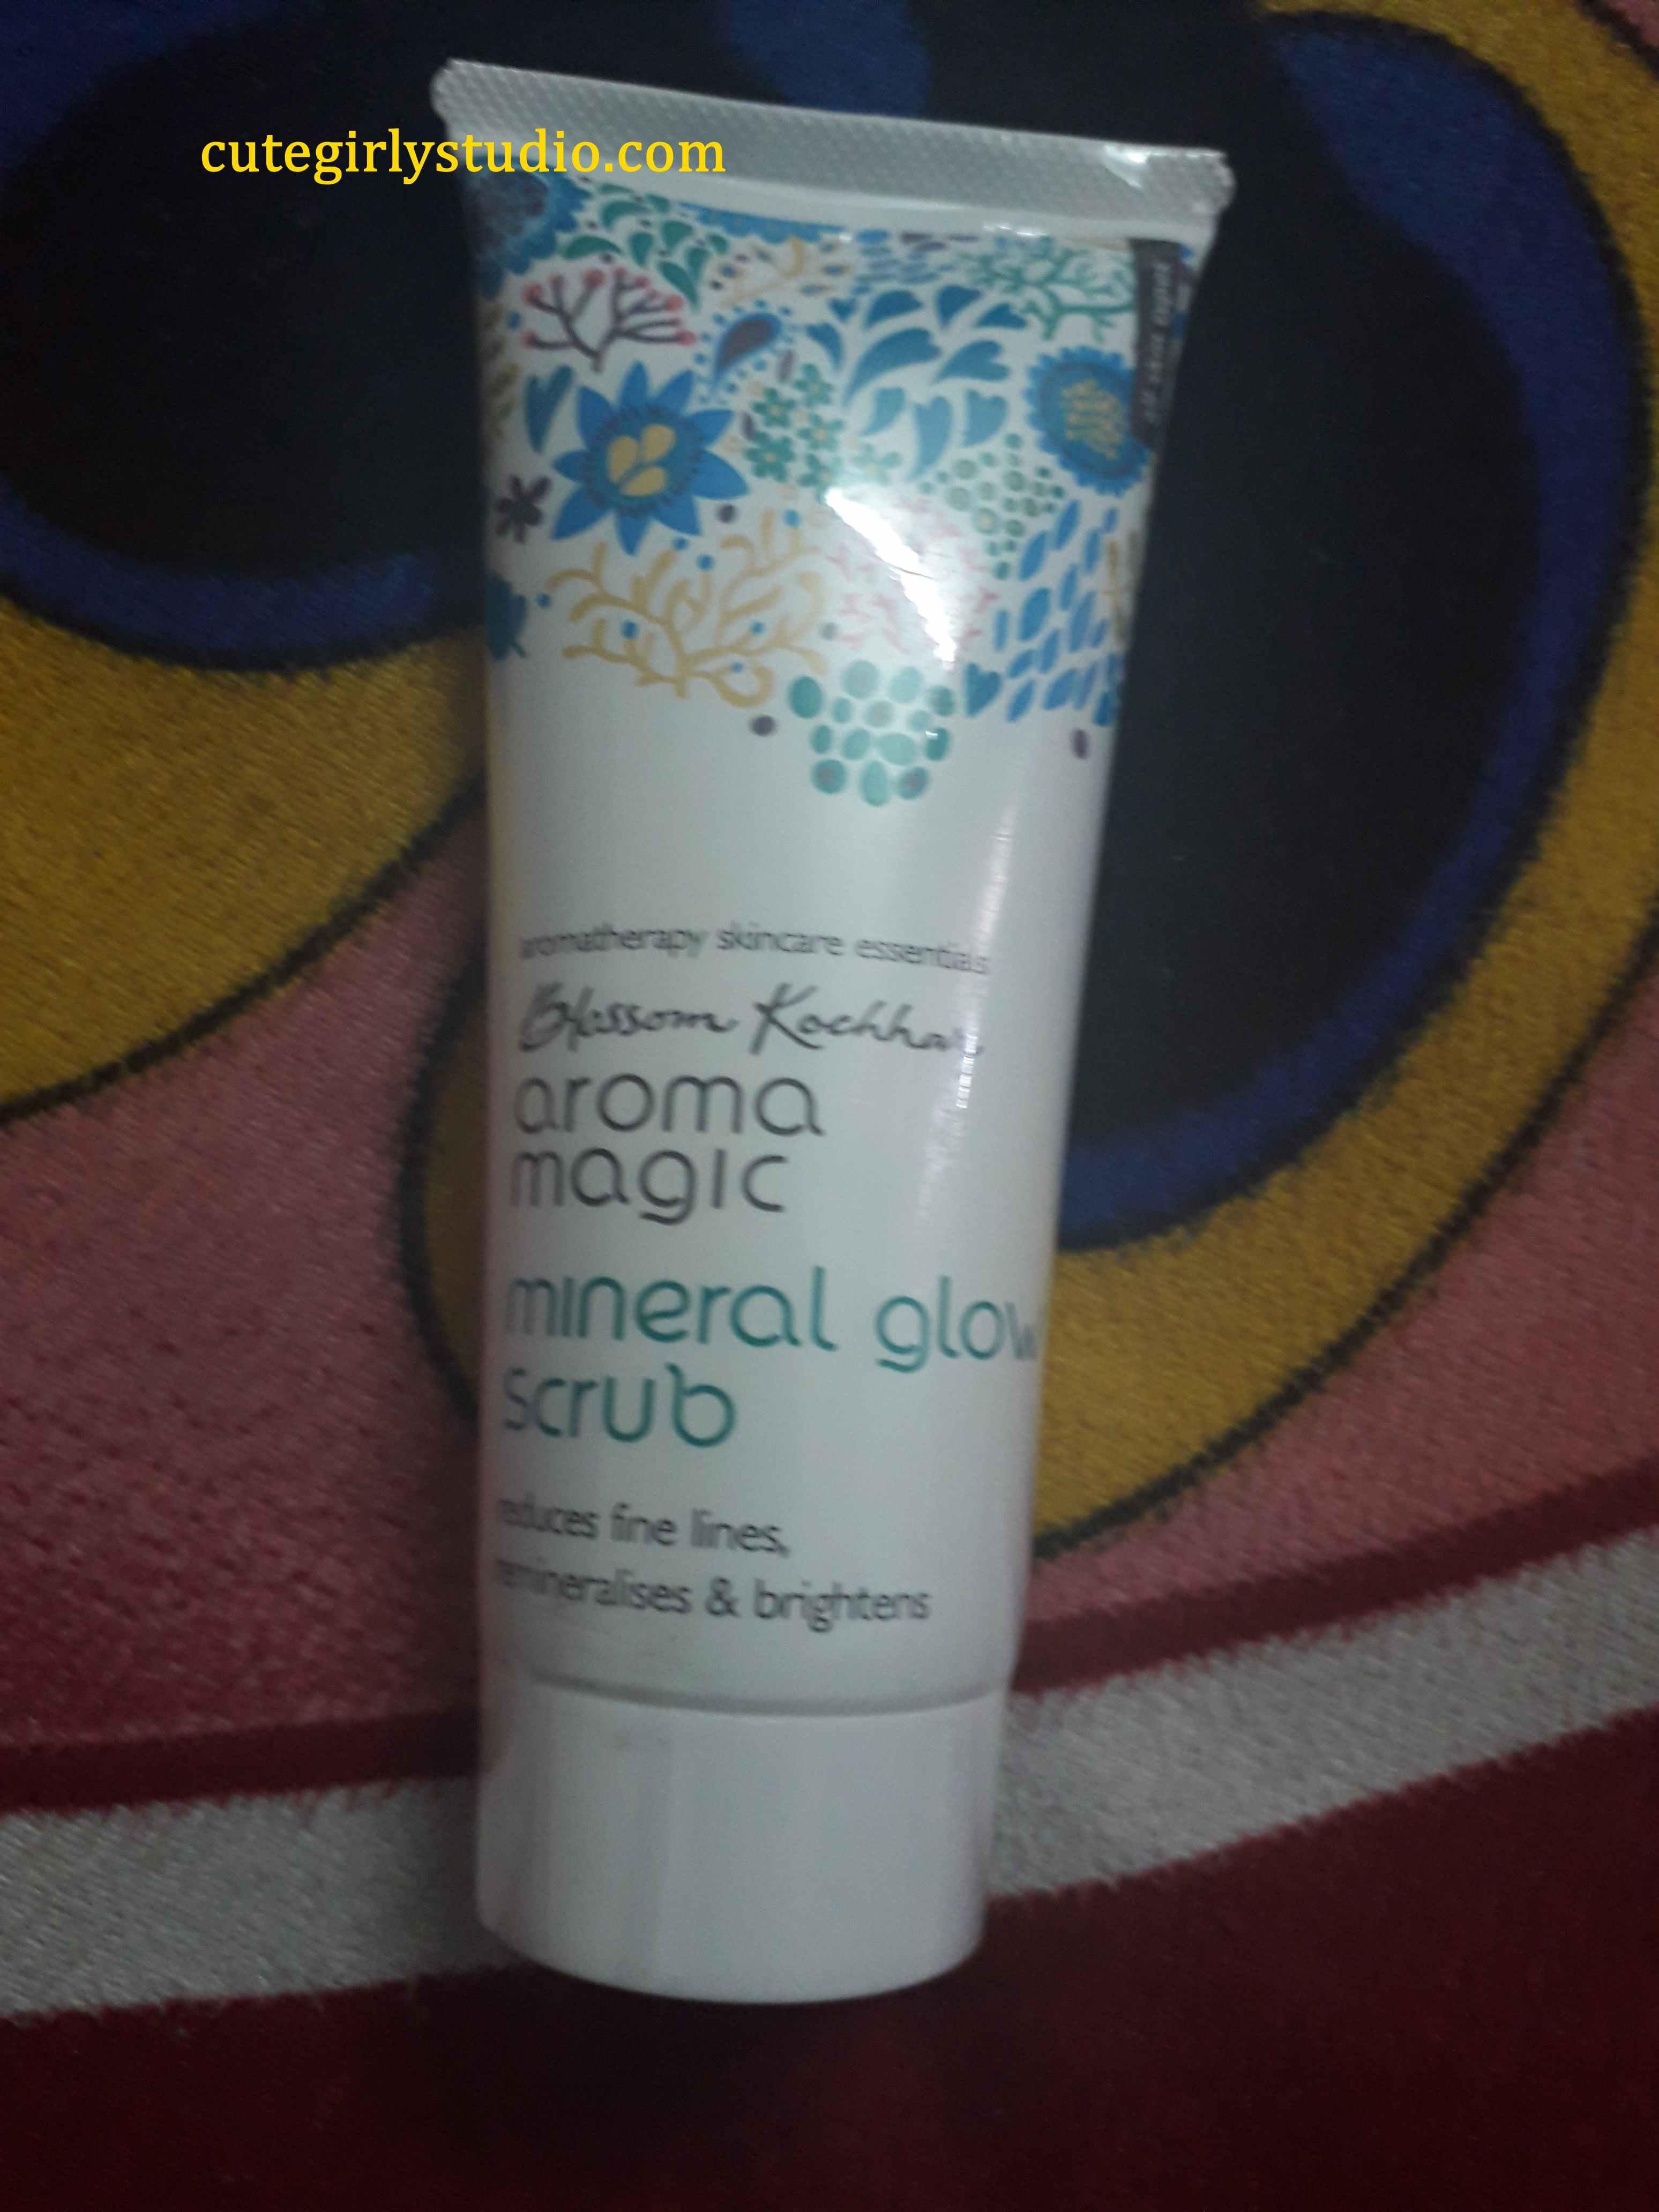 Aroma magic mineral glow scrub